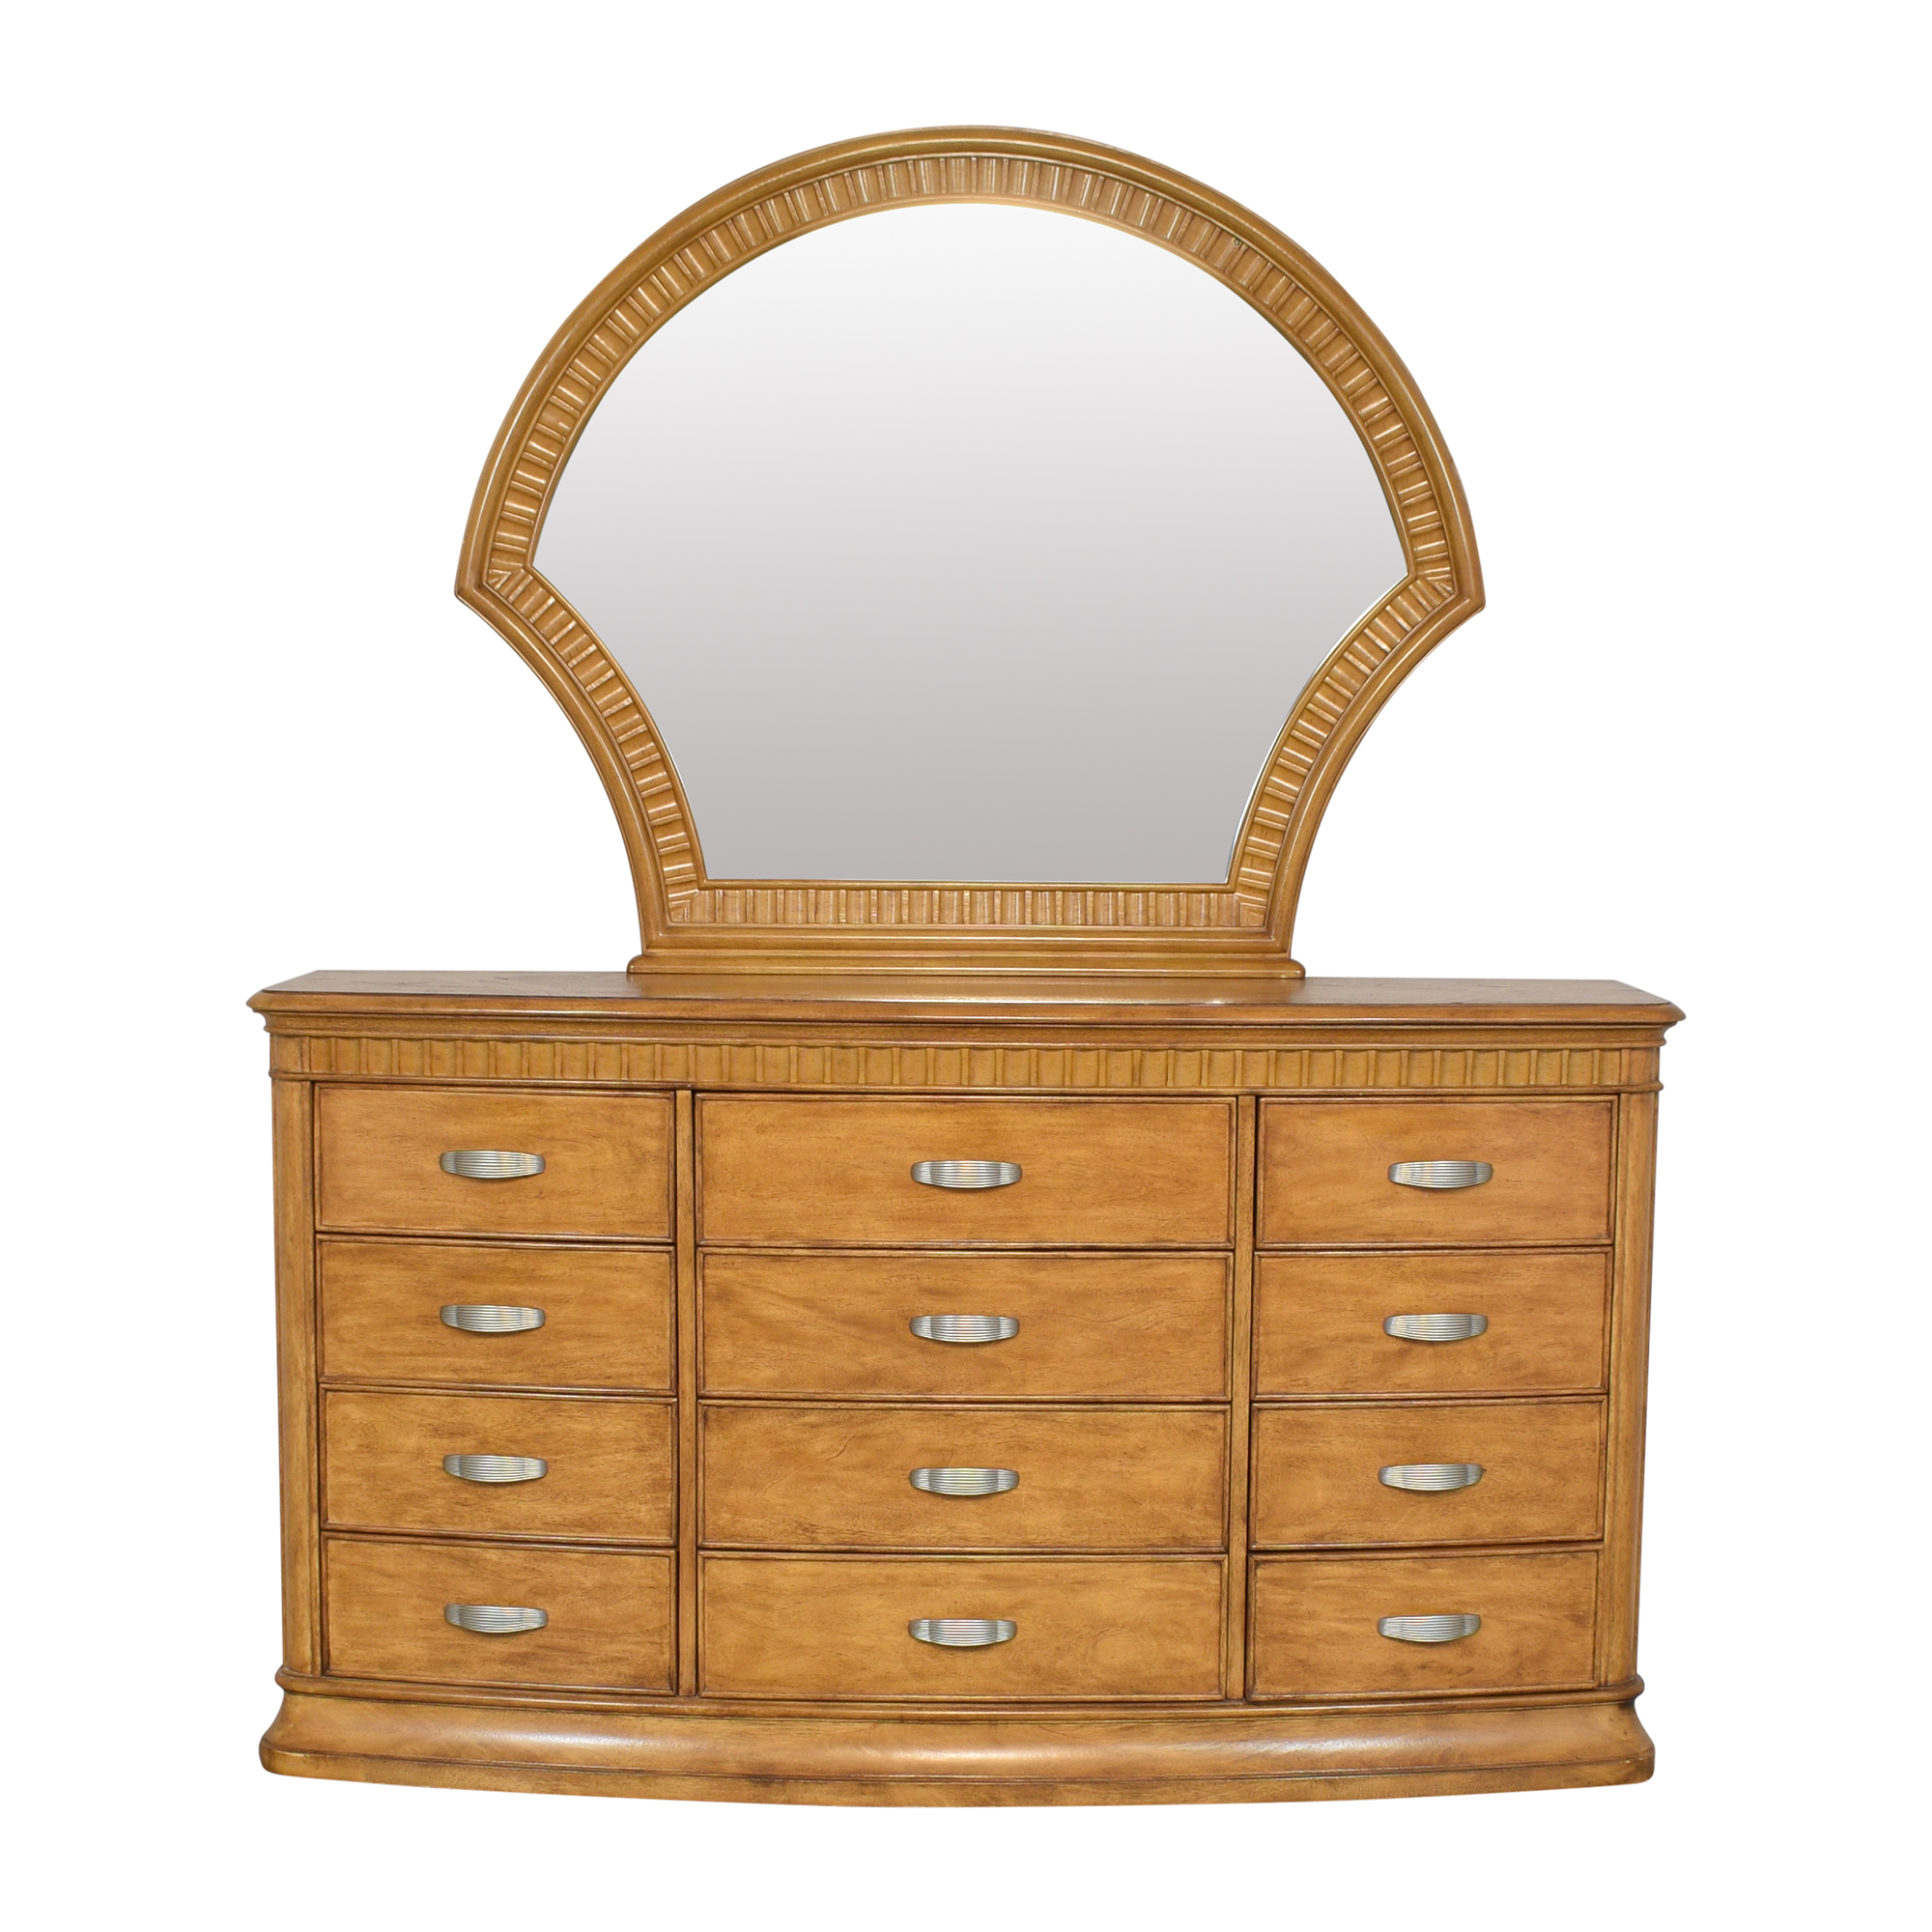 Triple Dresser Vanity with Mirror / Storage